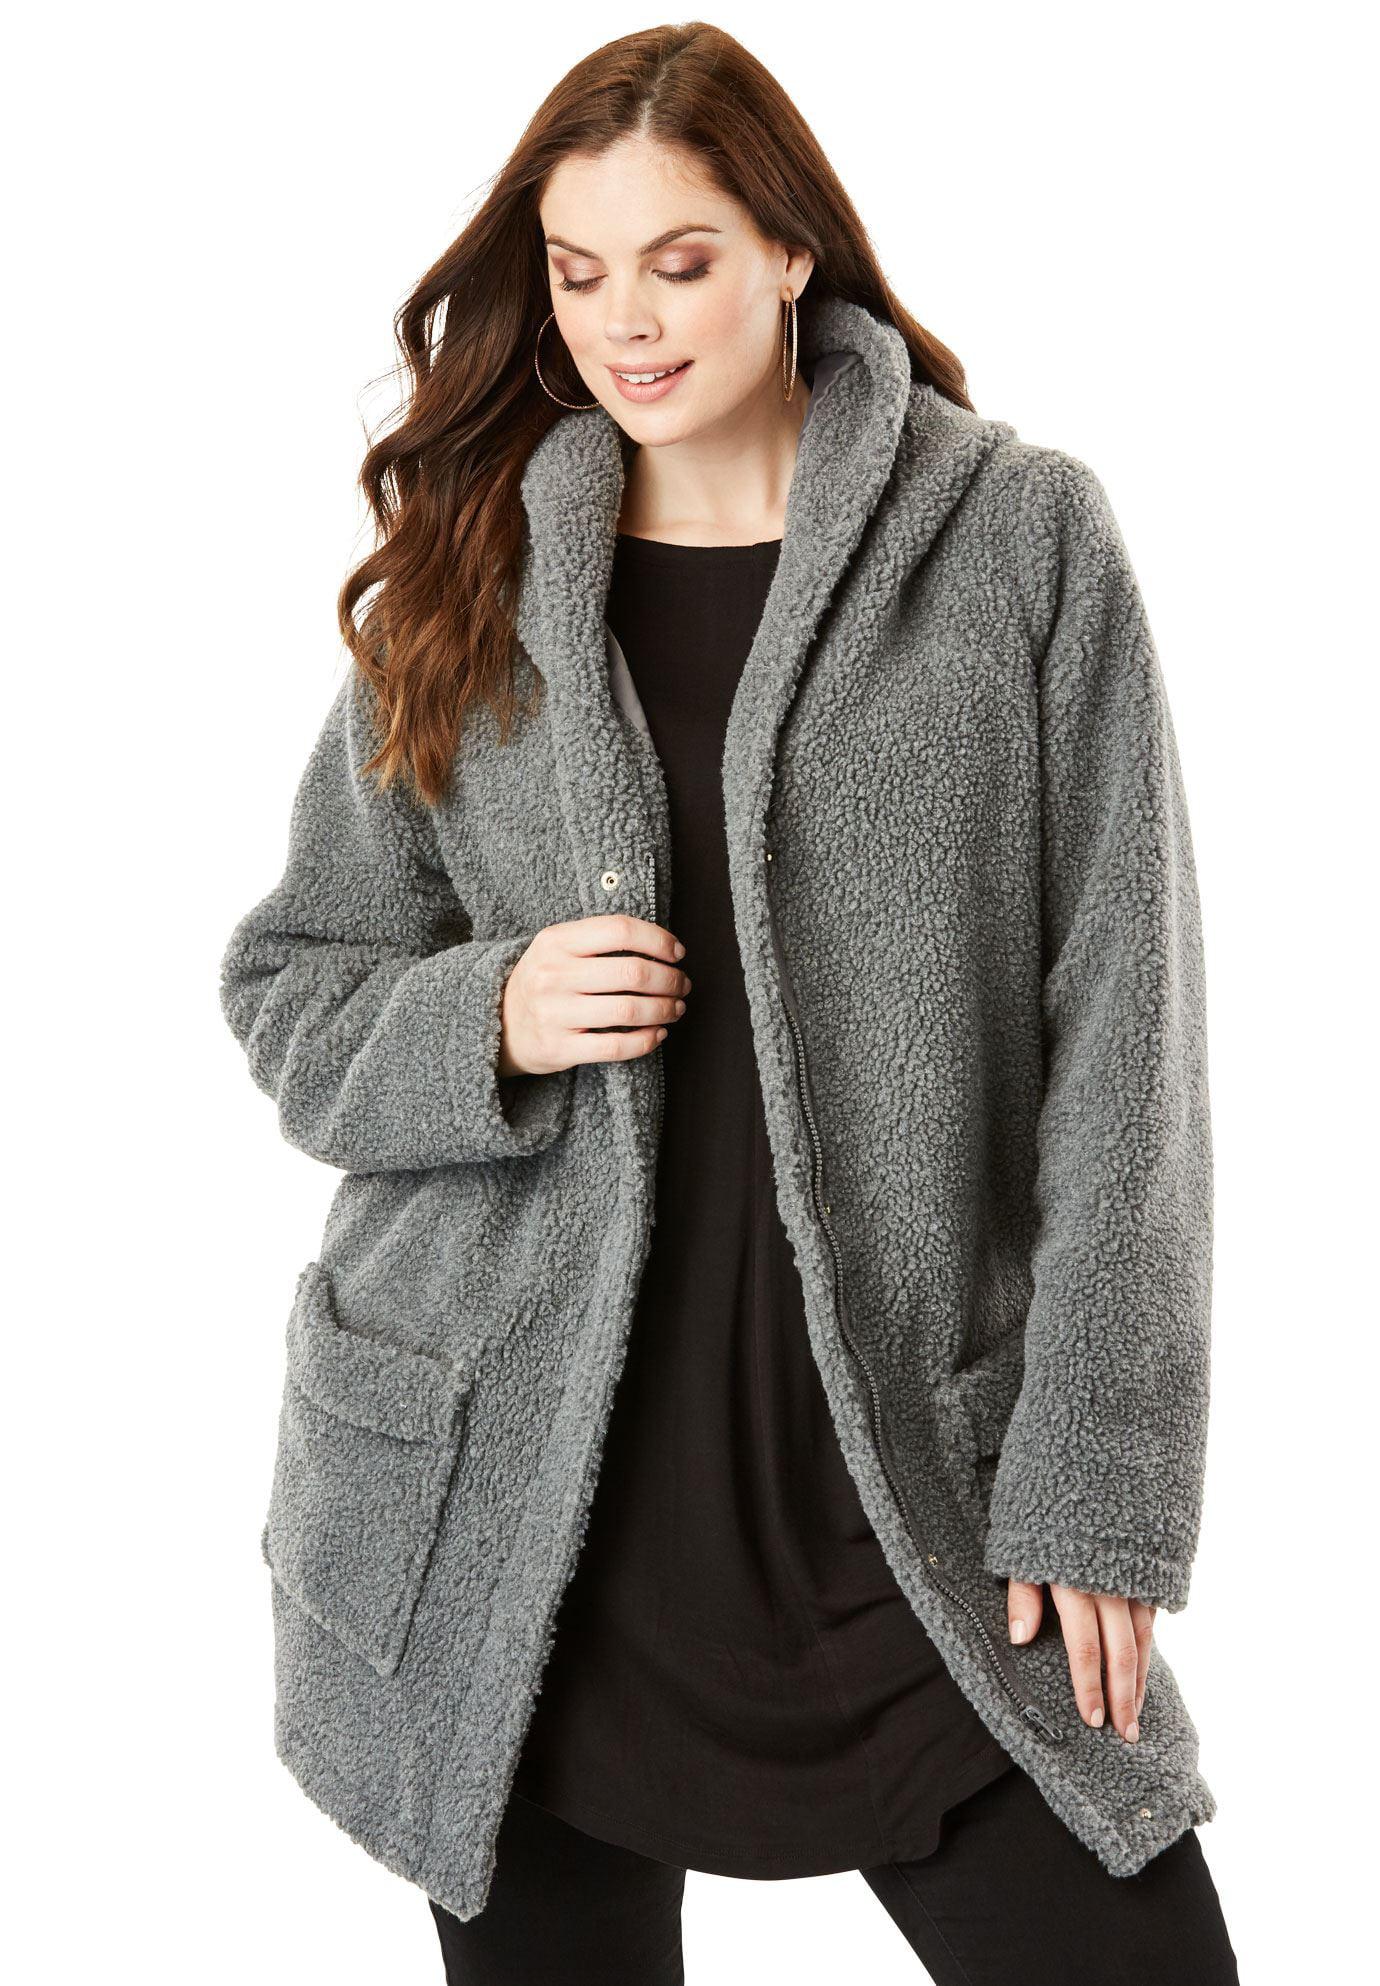 089d513e90e Roaman s - Plus Size Hooded Textured Fleece Coat - Walmart.com